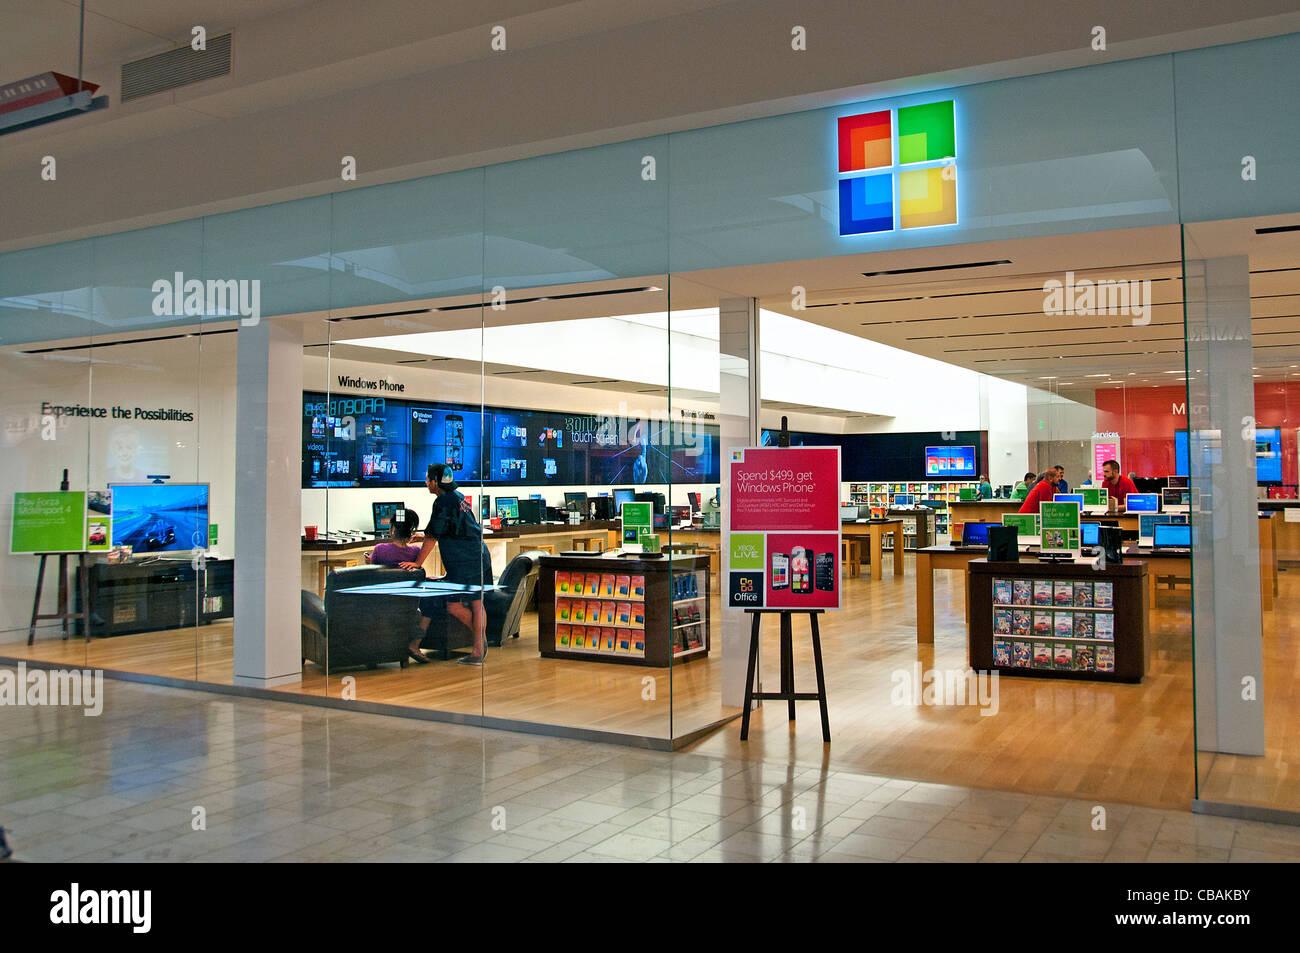 Windows Phone Microsoft shopping mall shop store telefono computer negli Stati Uniti Immagini Stock